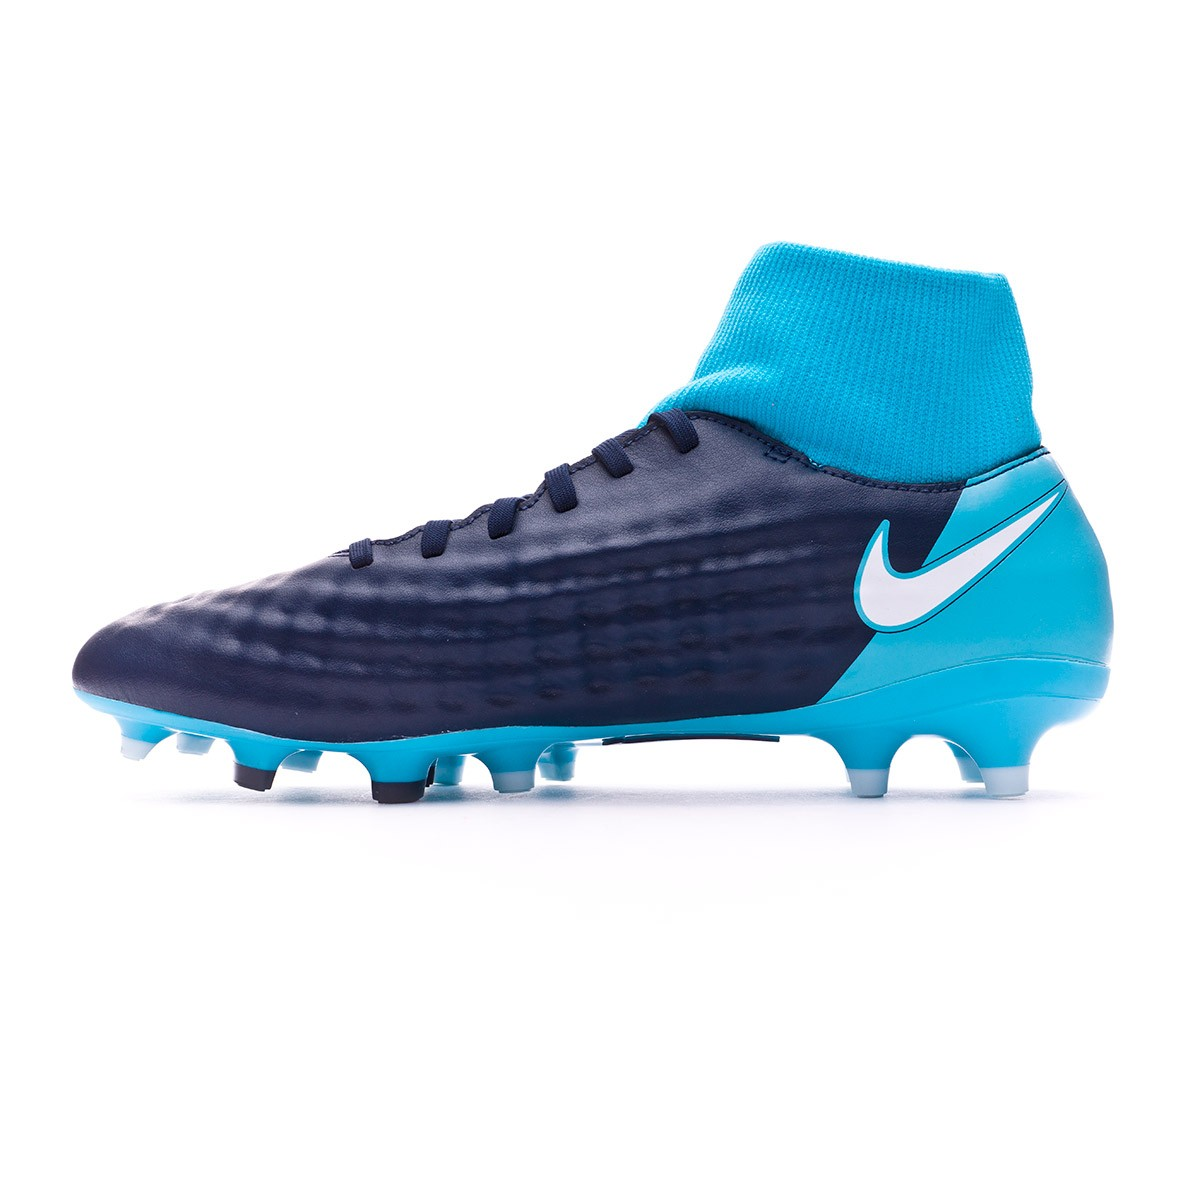 c5ec4f0e5527 Football Boots Nike Magista Onda II DF FG Glacier blue-Gamma  blue-Obsidian-White - Football store Fútbol Emotion